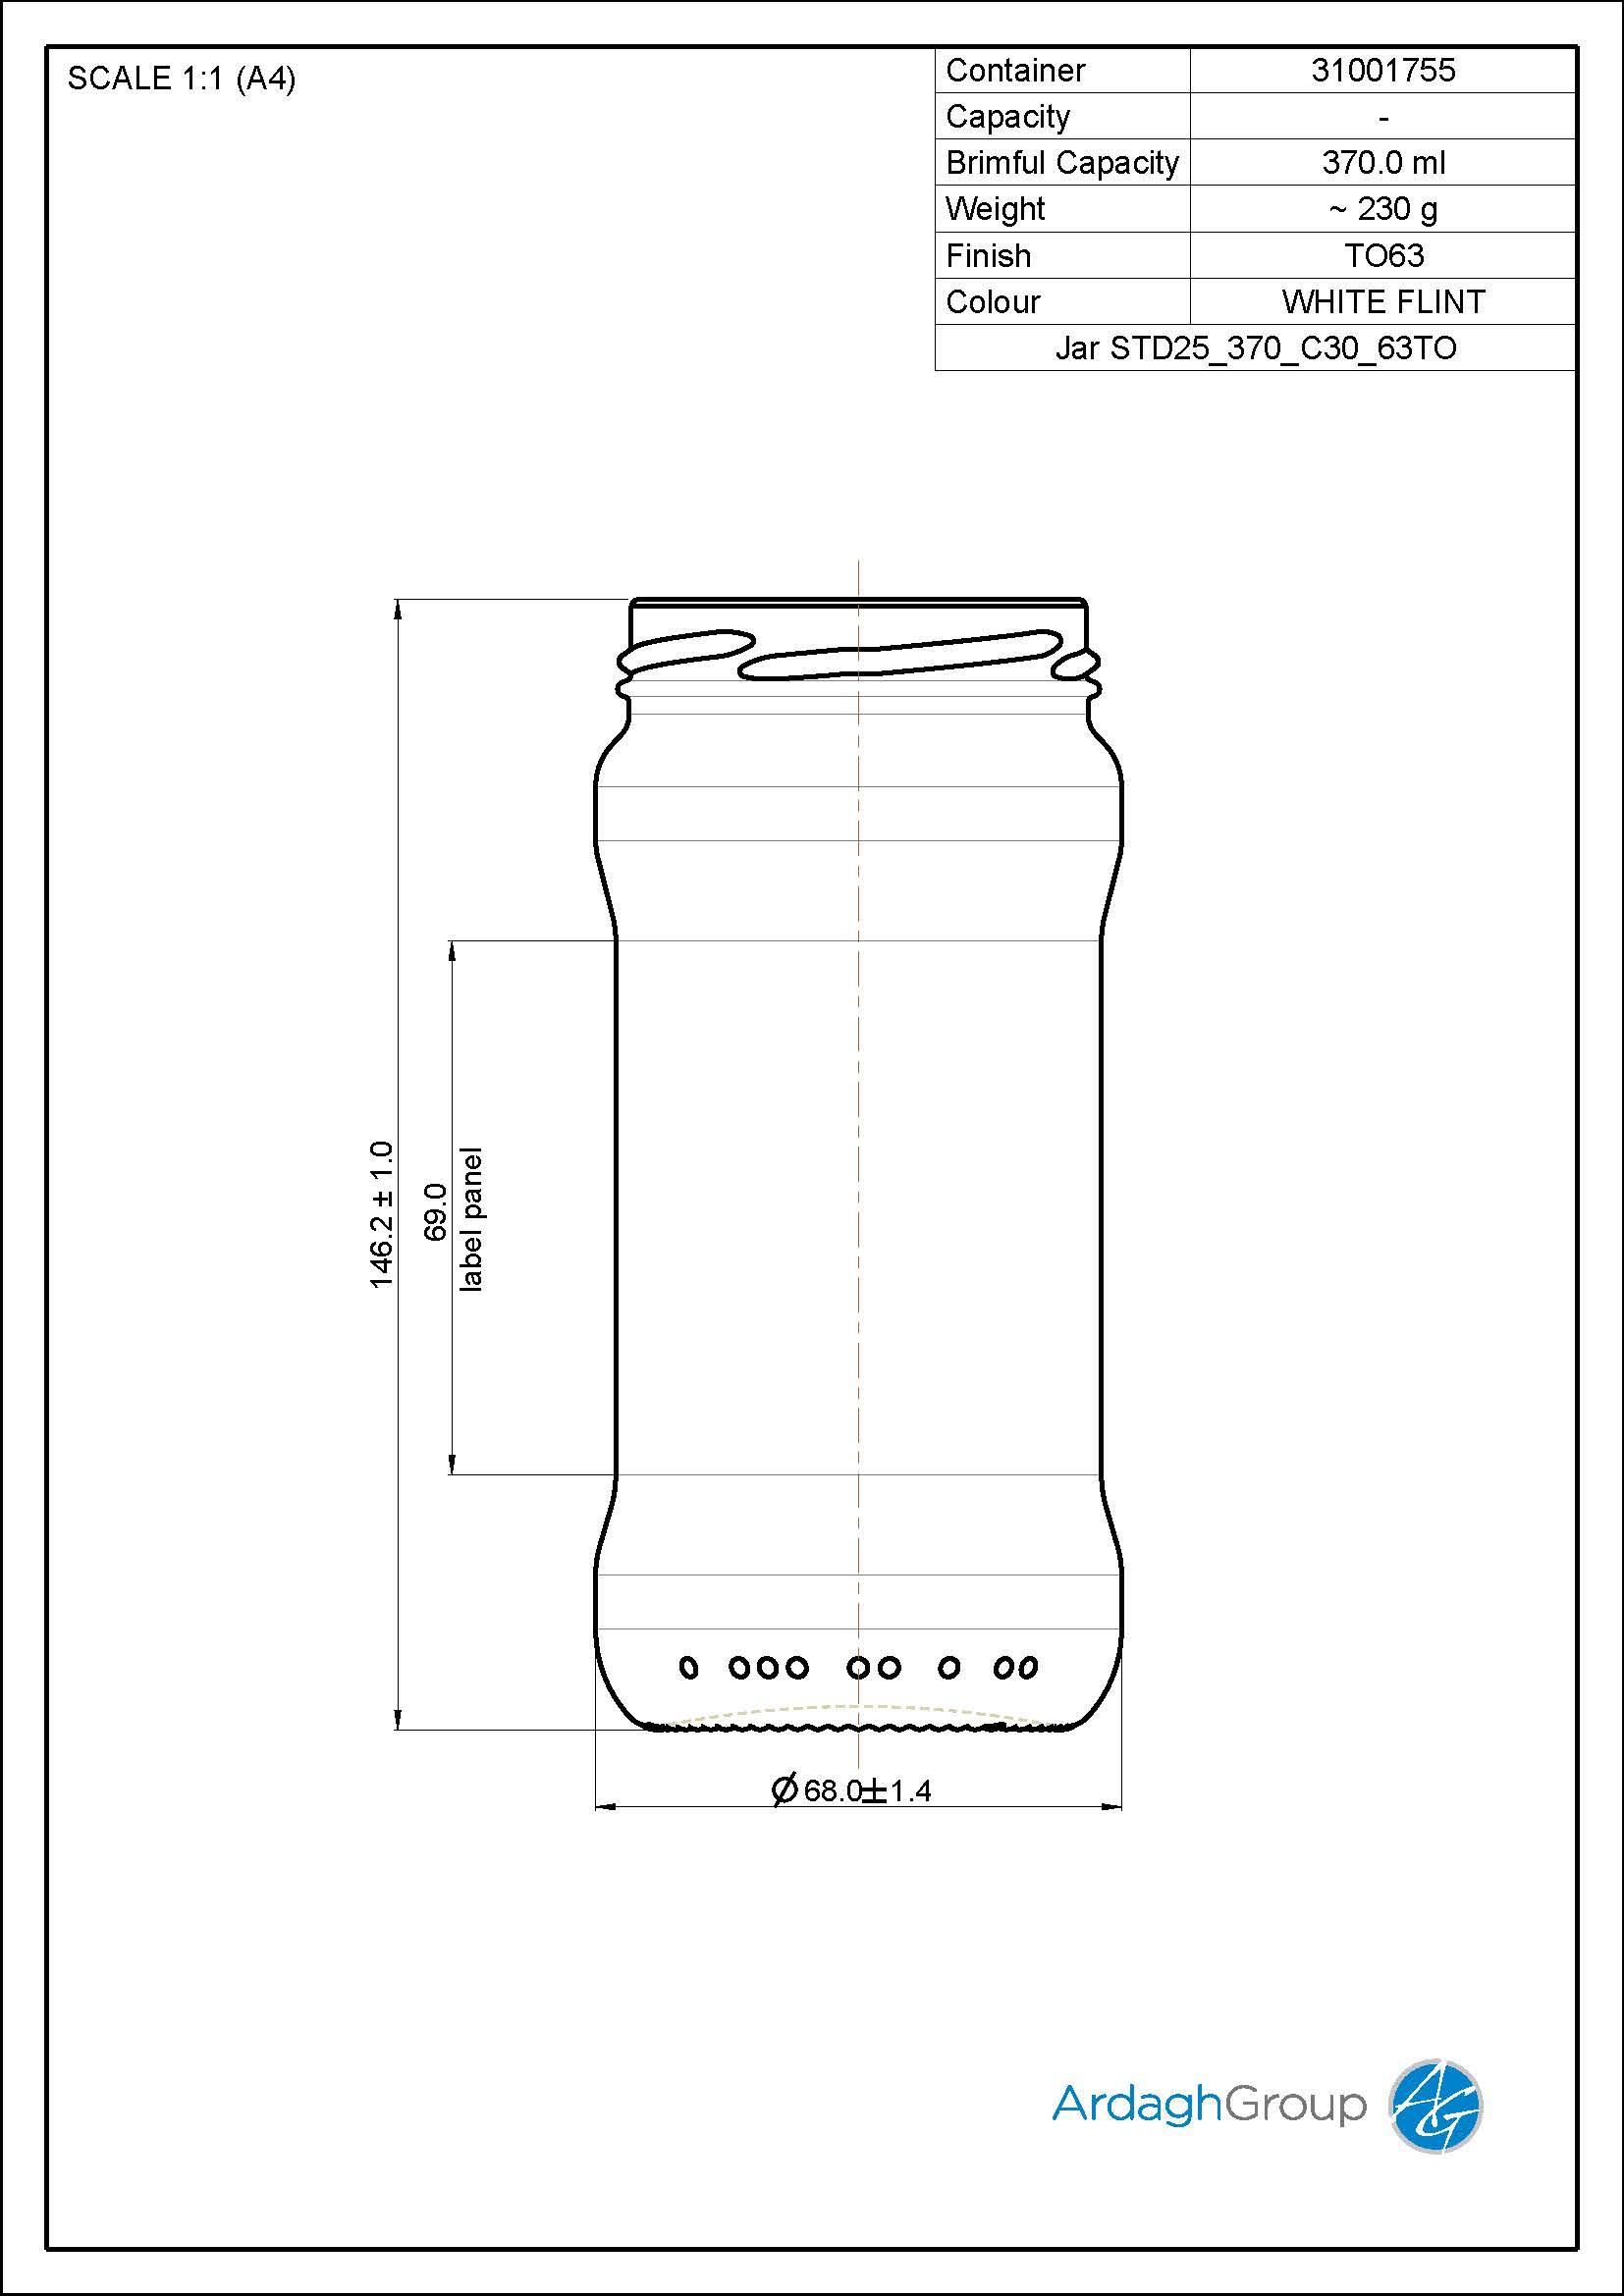 Jar STD25 370 C30 63TO